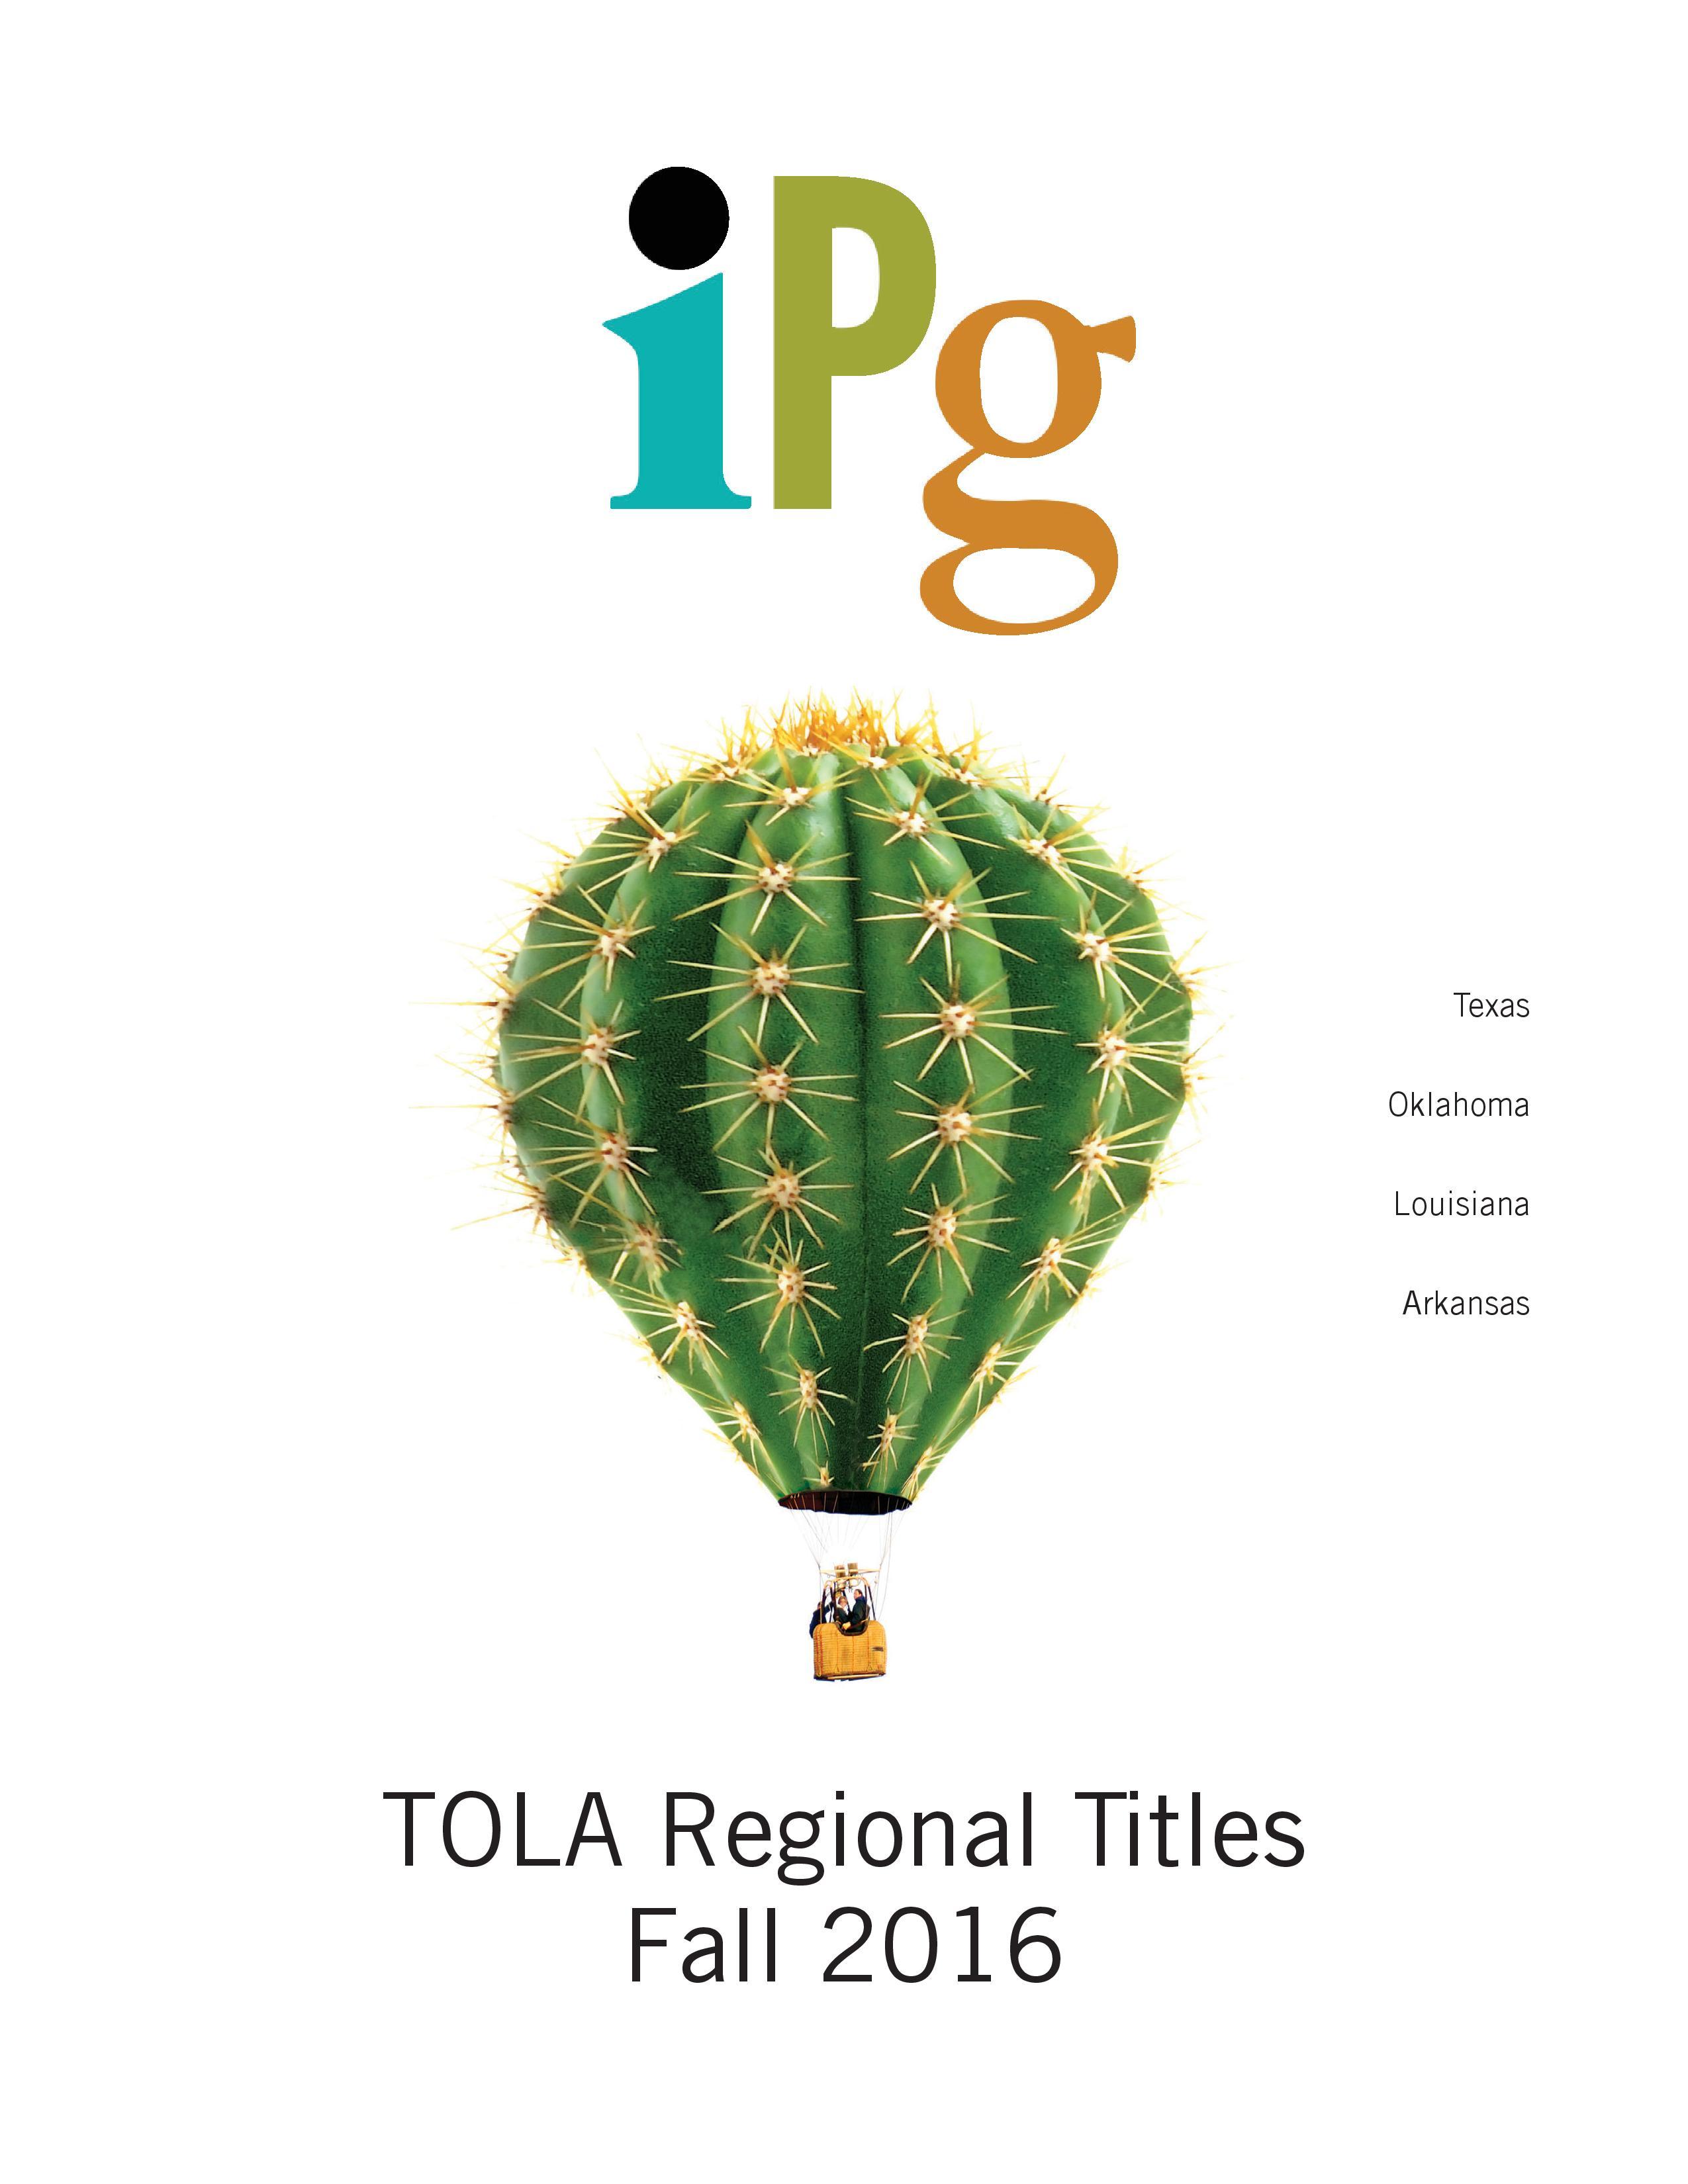 TOLA Regional Titles